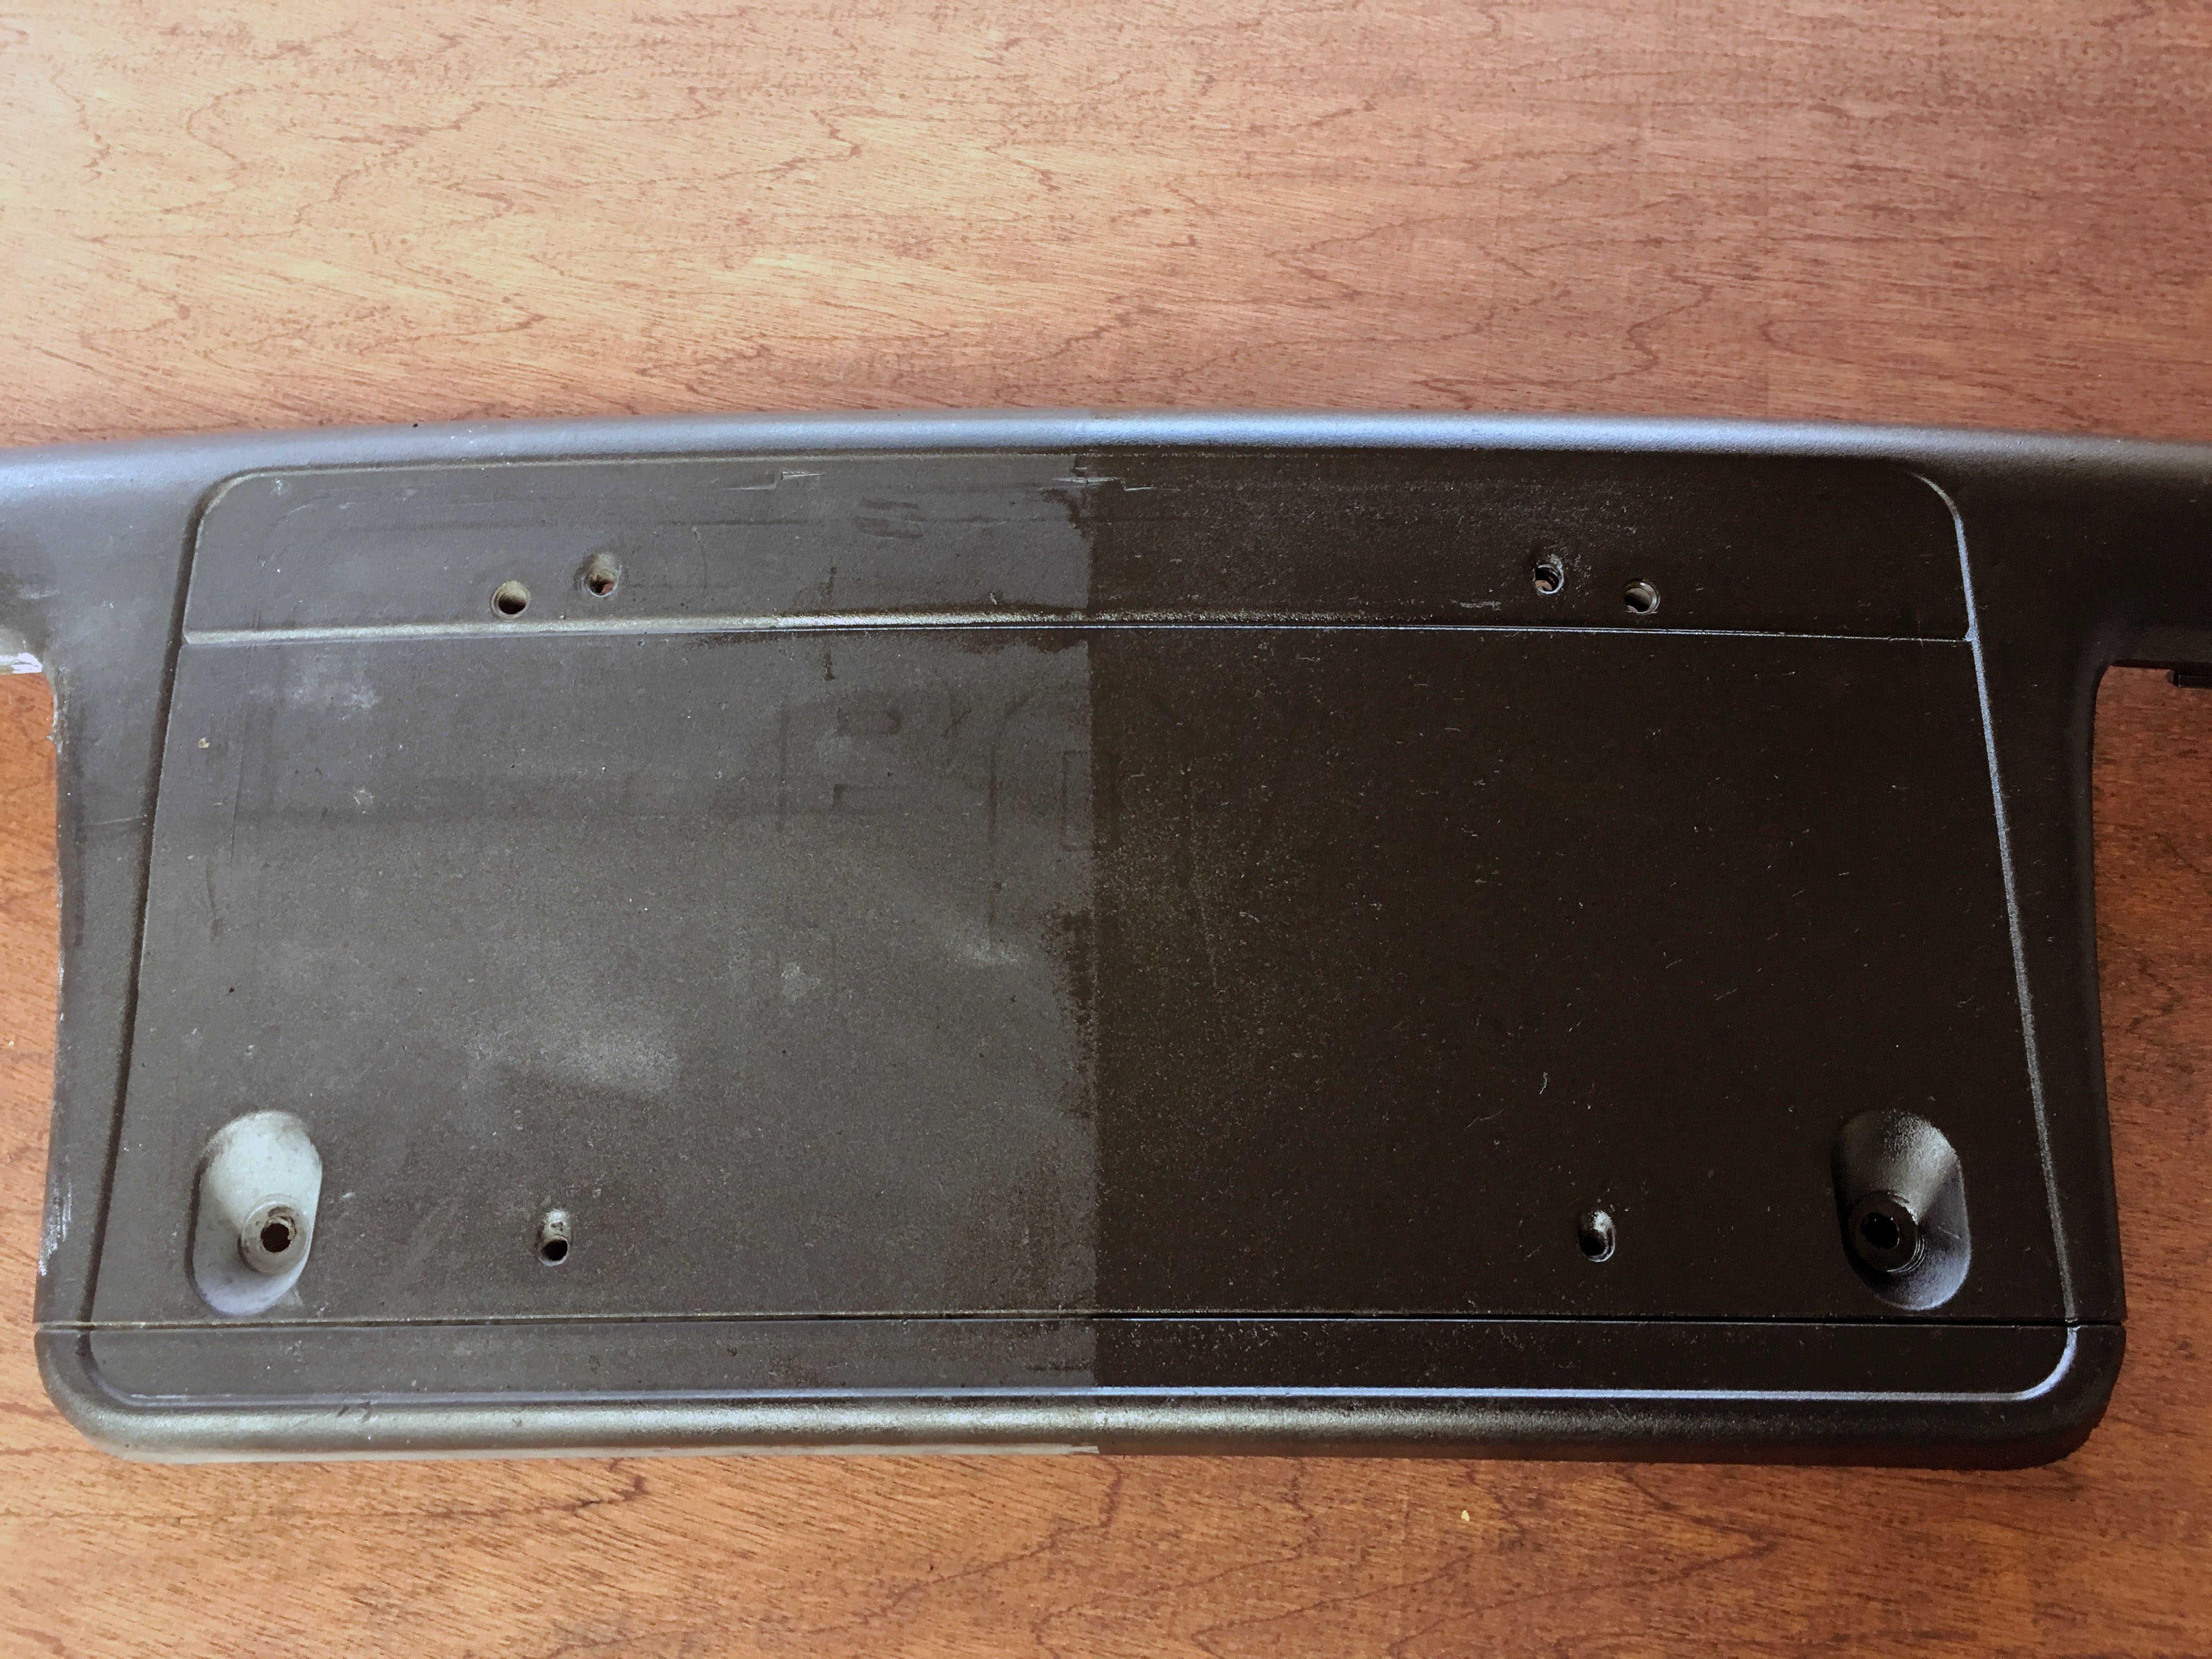 E46 license plate holder plastic restoration